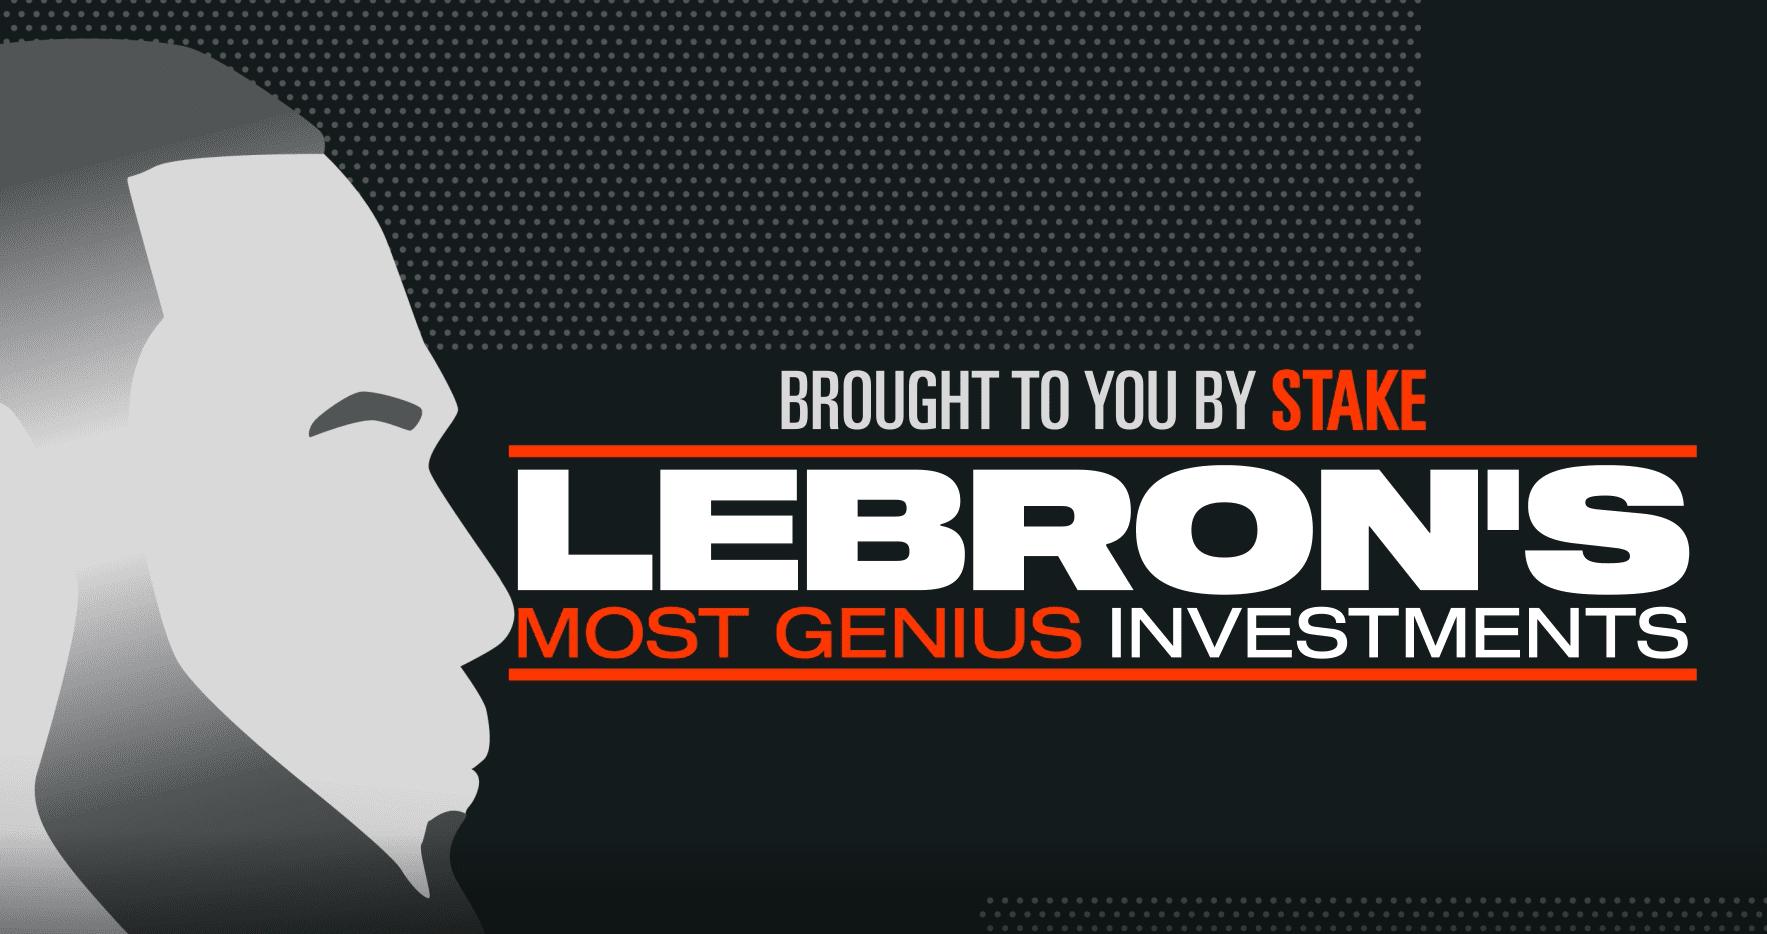 LeBron James' Most Genius Investments